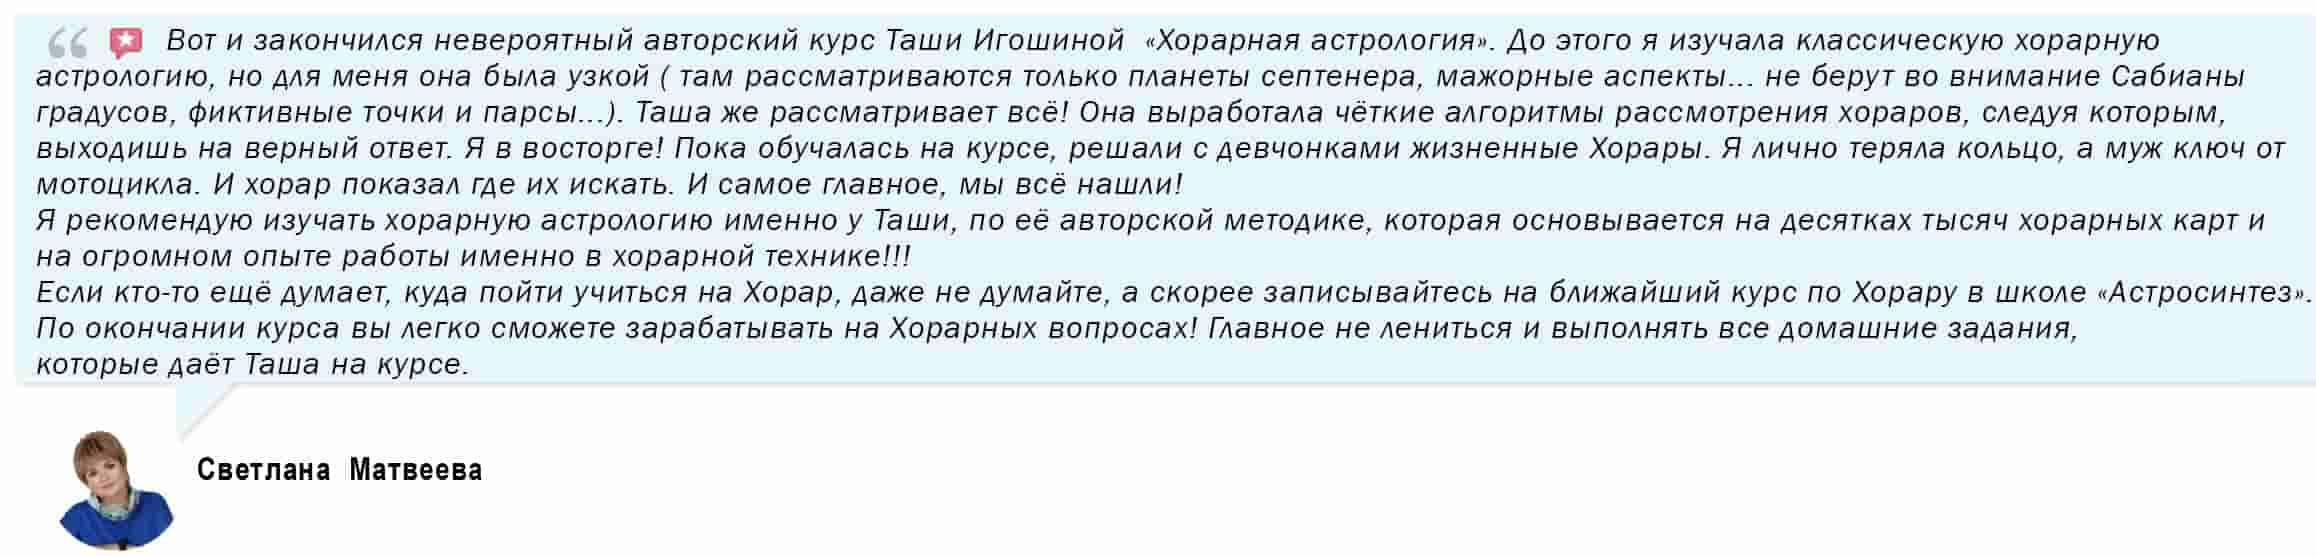 https://astrologtasha.ru/wp-content/uploads/2021/07/отзыв-Матвеева.jpg